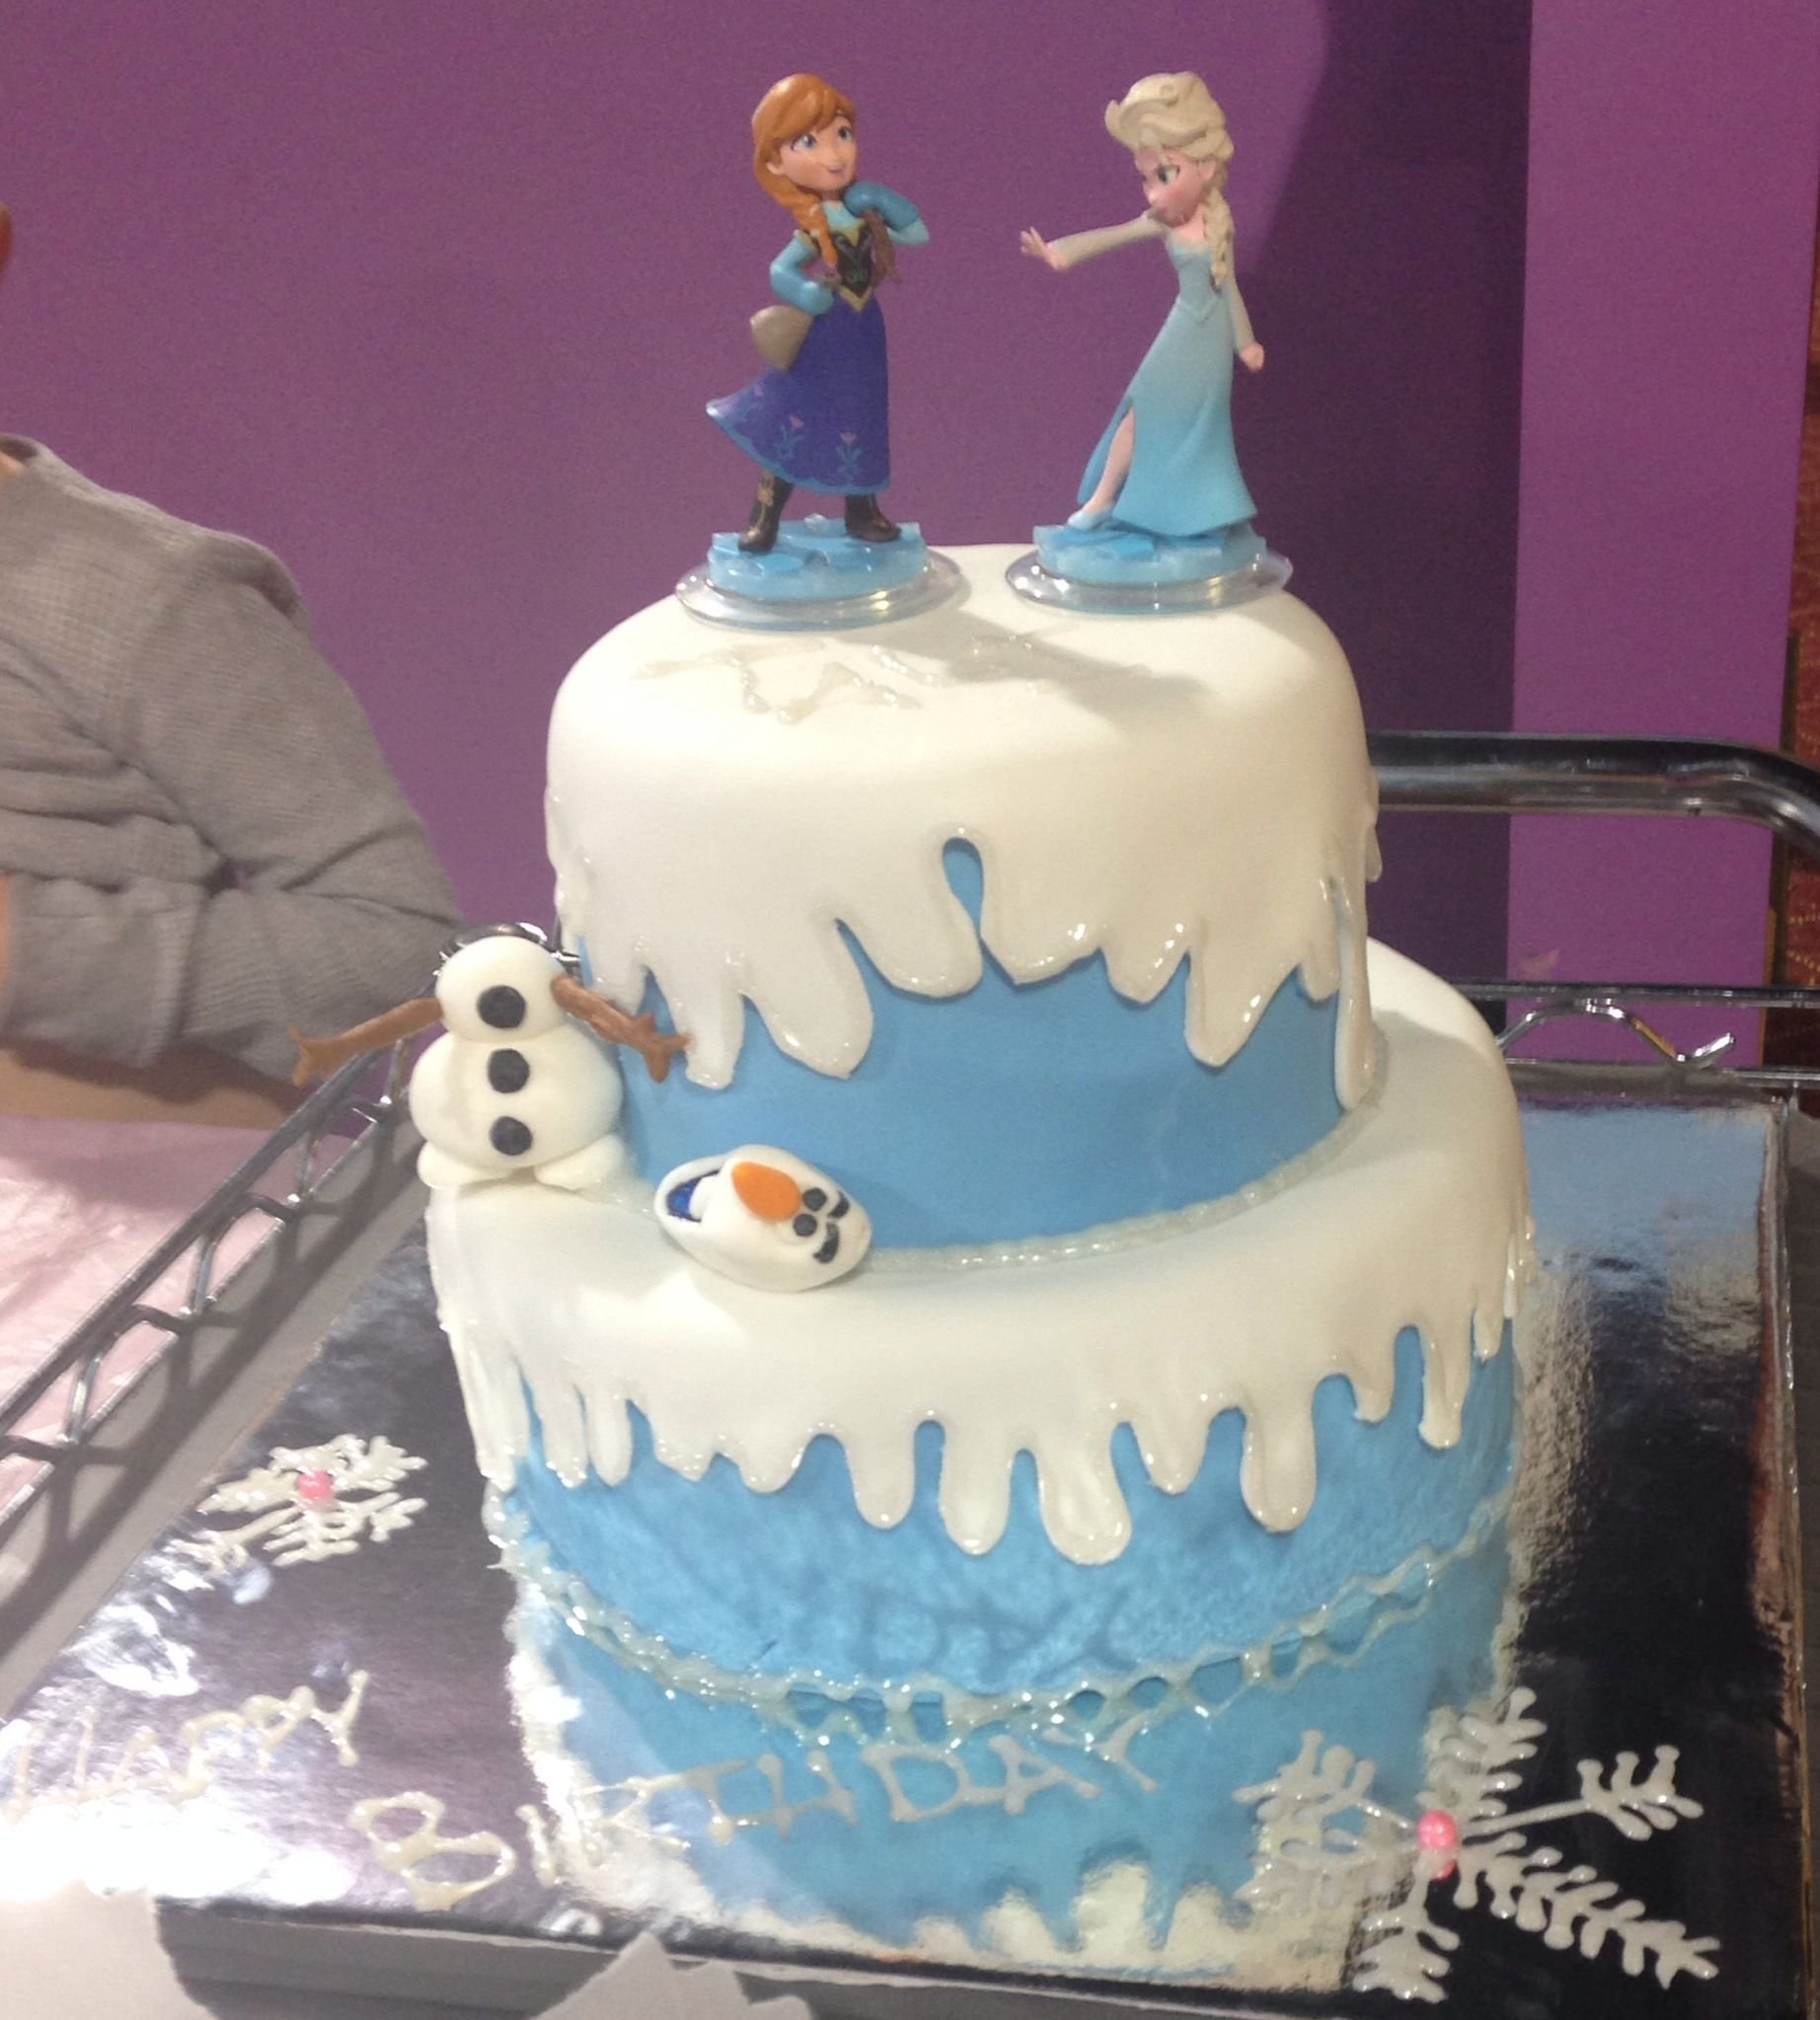 10 Great 4 Year Old Birthday Cake Ideas disney frozen birthday cake for a 4 year old hillymills cakes